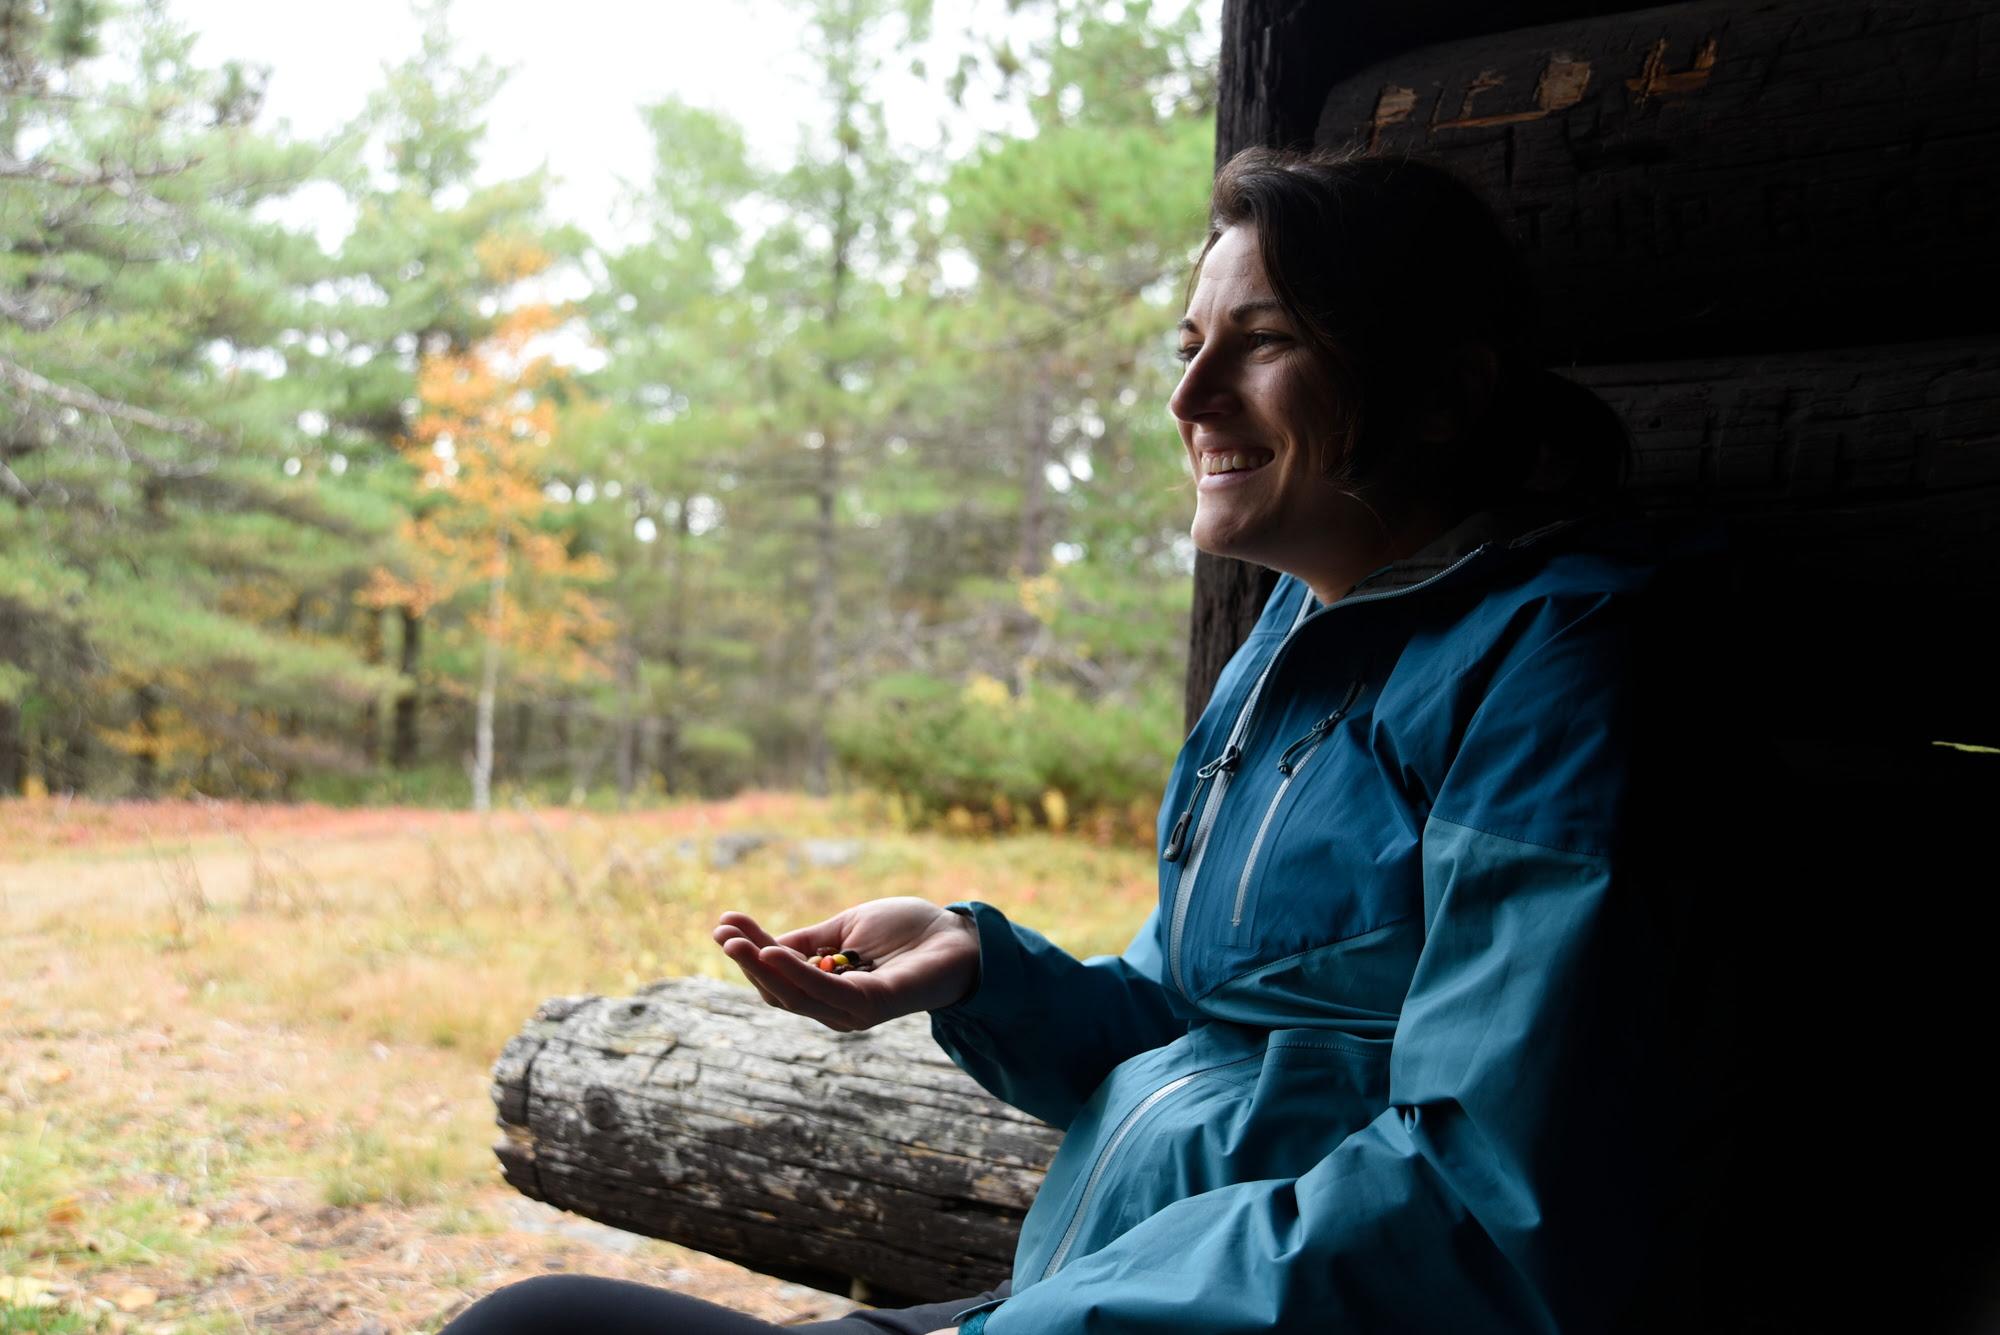 Hiker Eating Snack in Lean-to